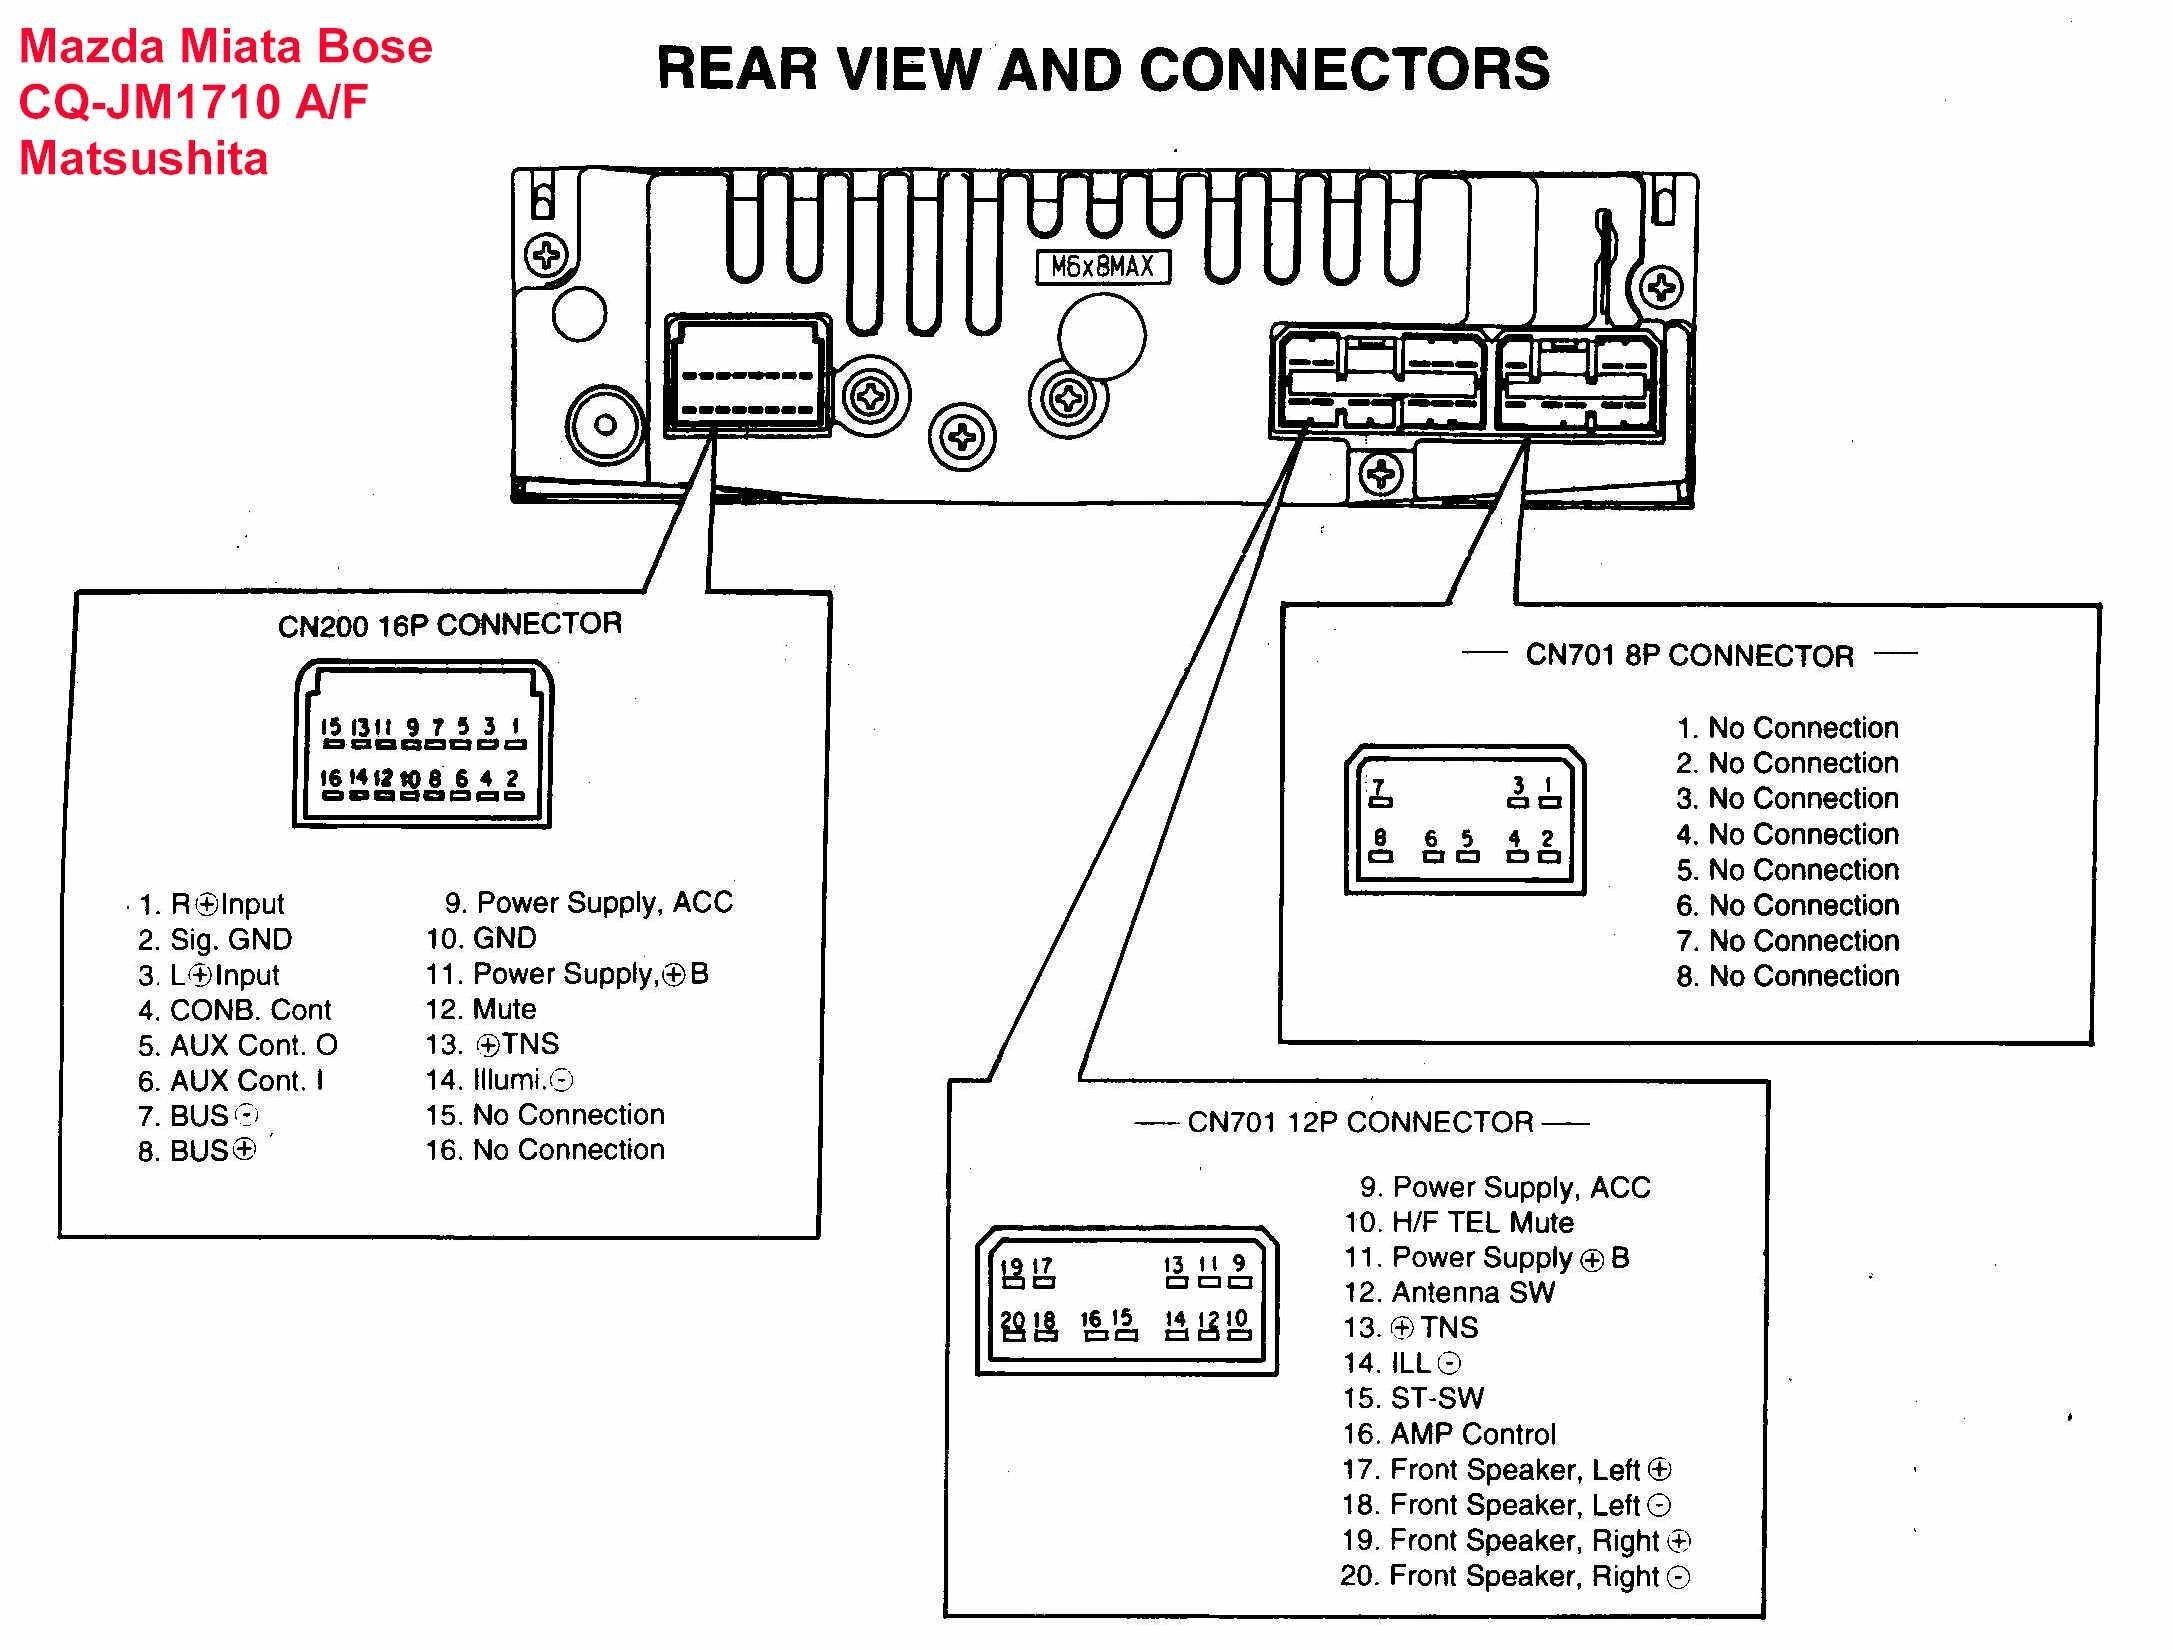 mazda b series radio wiring diagram | wiring diagrams rest maybe  wiring diagram library